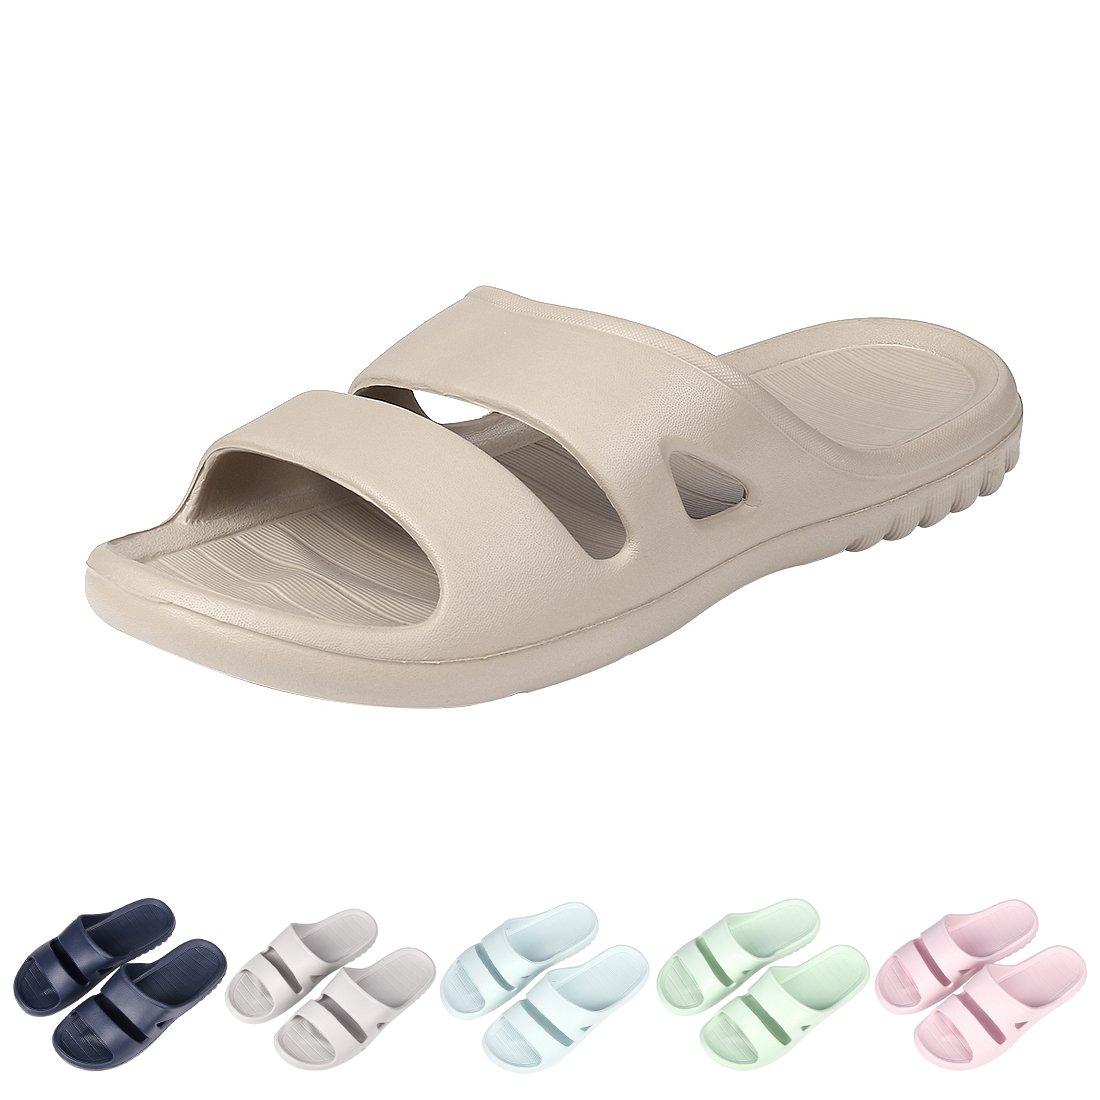 Women's Shower Pool Sandal Slippers Soft Ultra Lightweight Bath Slippers 29CF-L